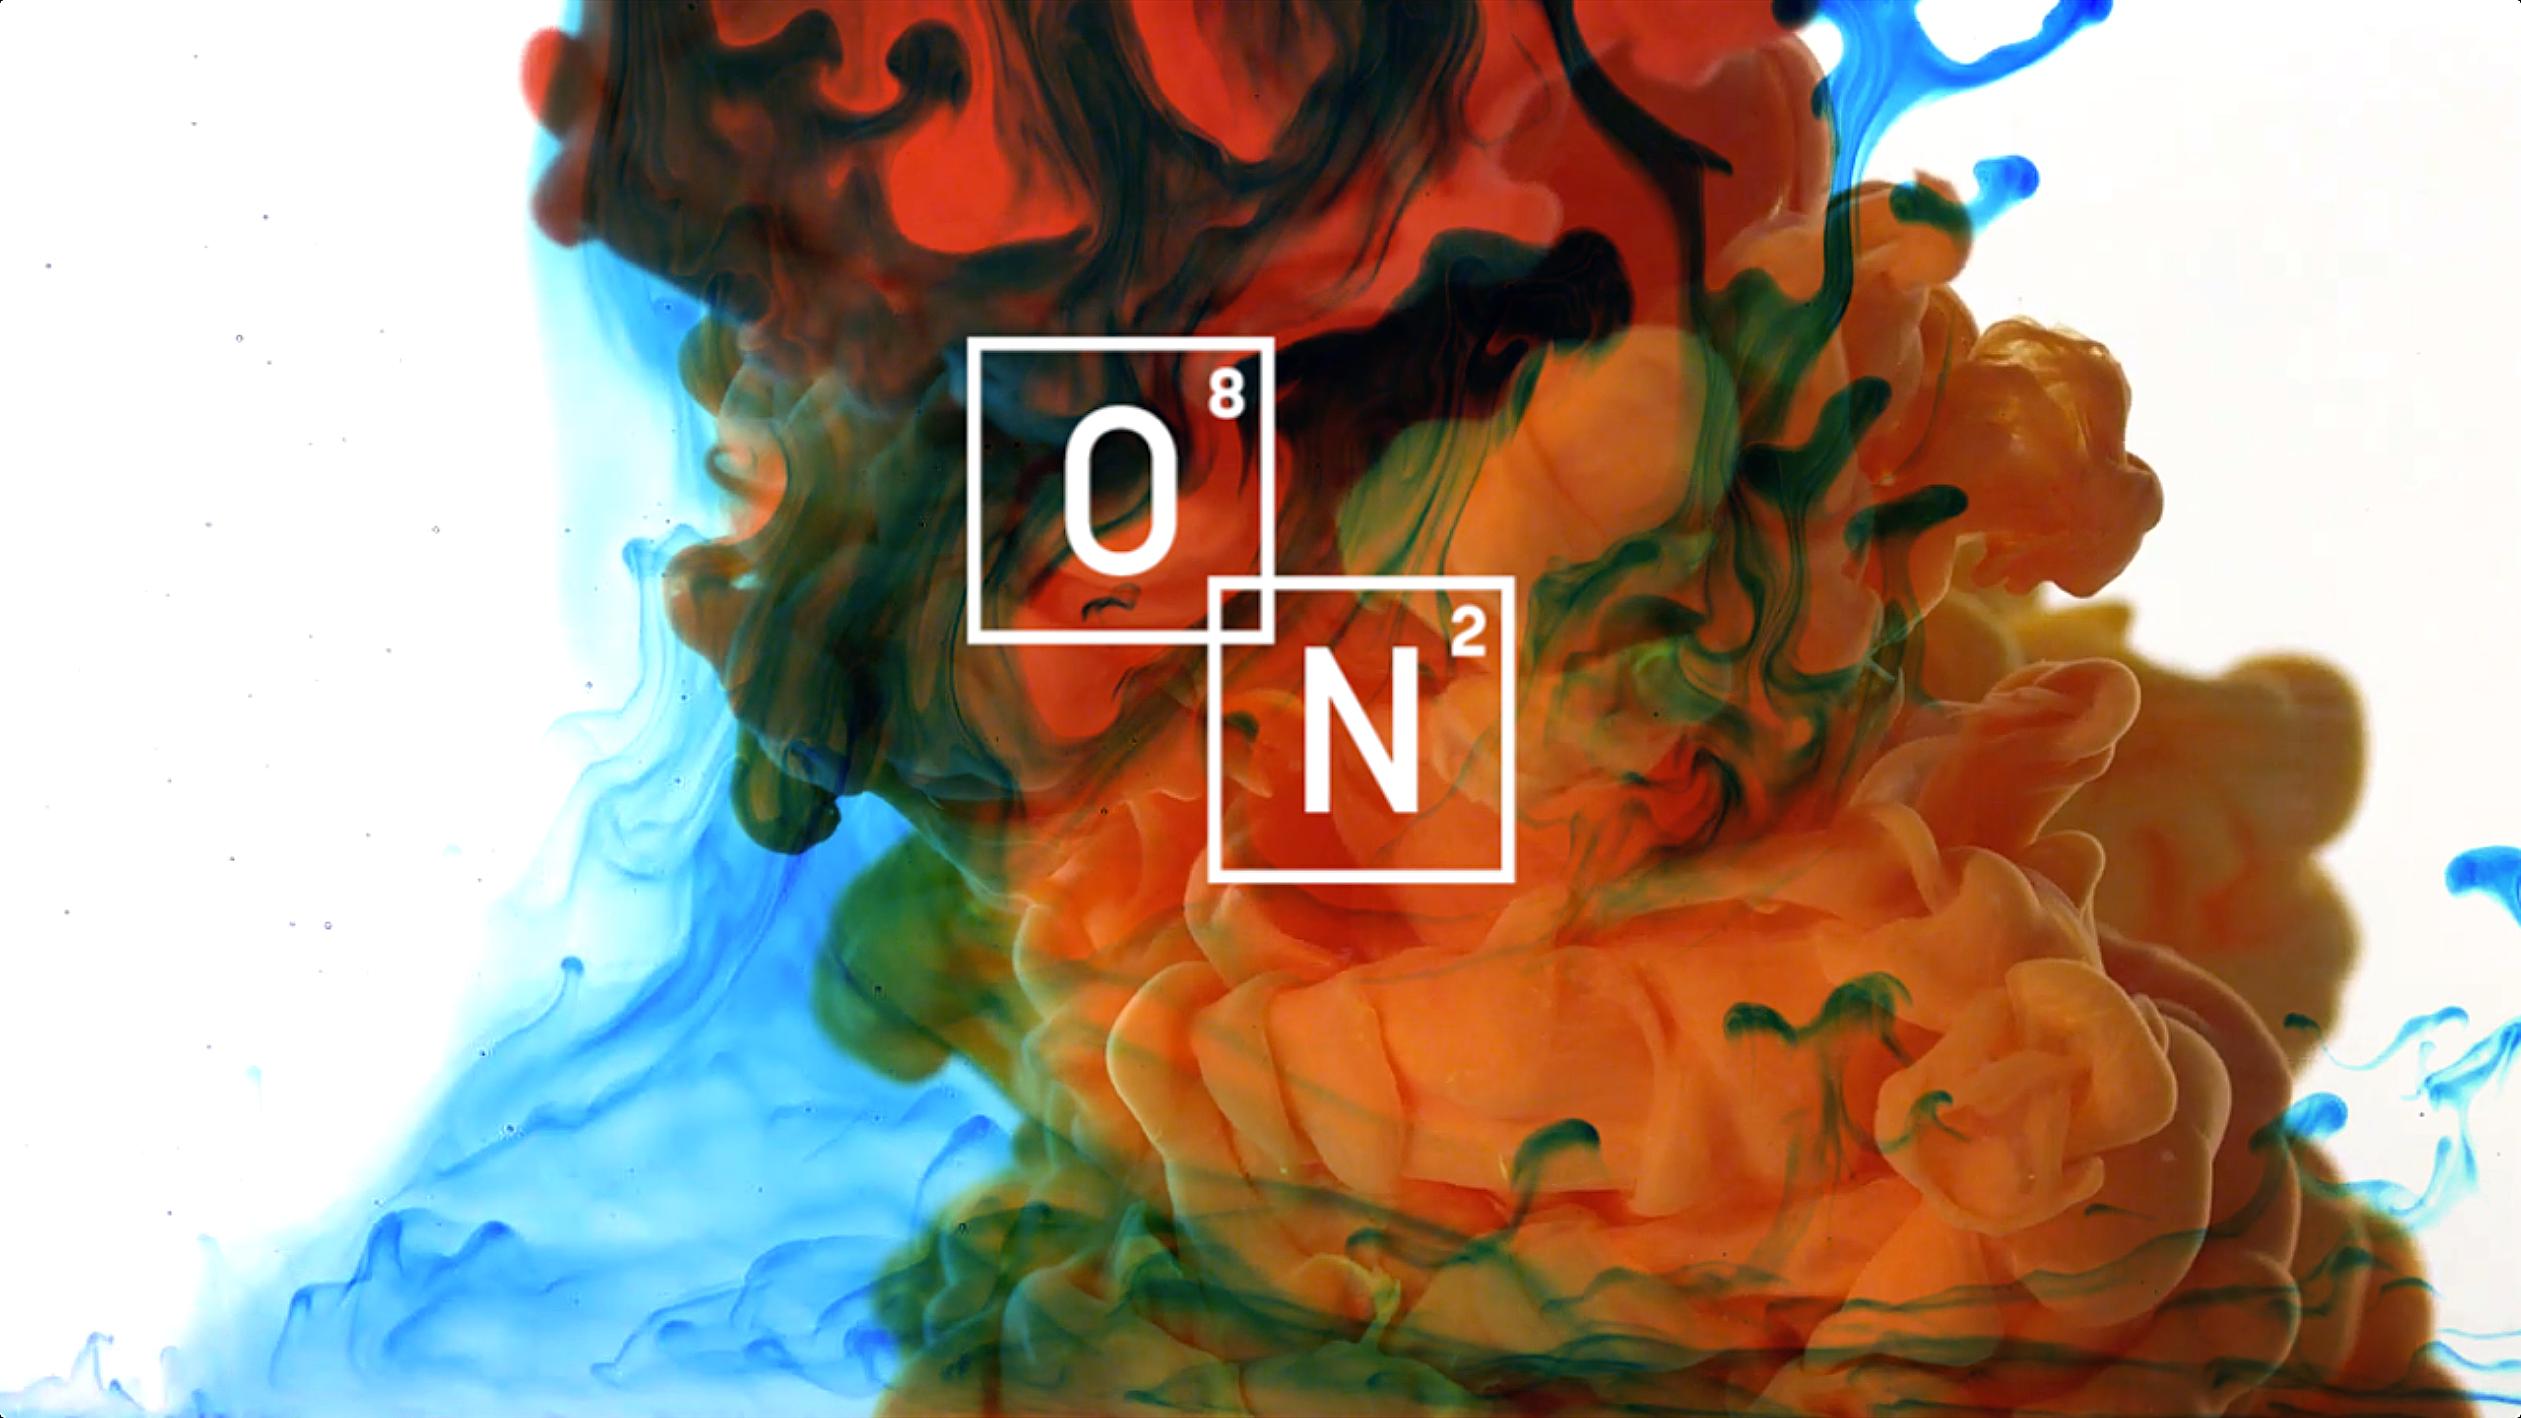 ozone 8